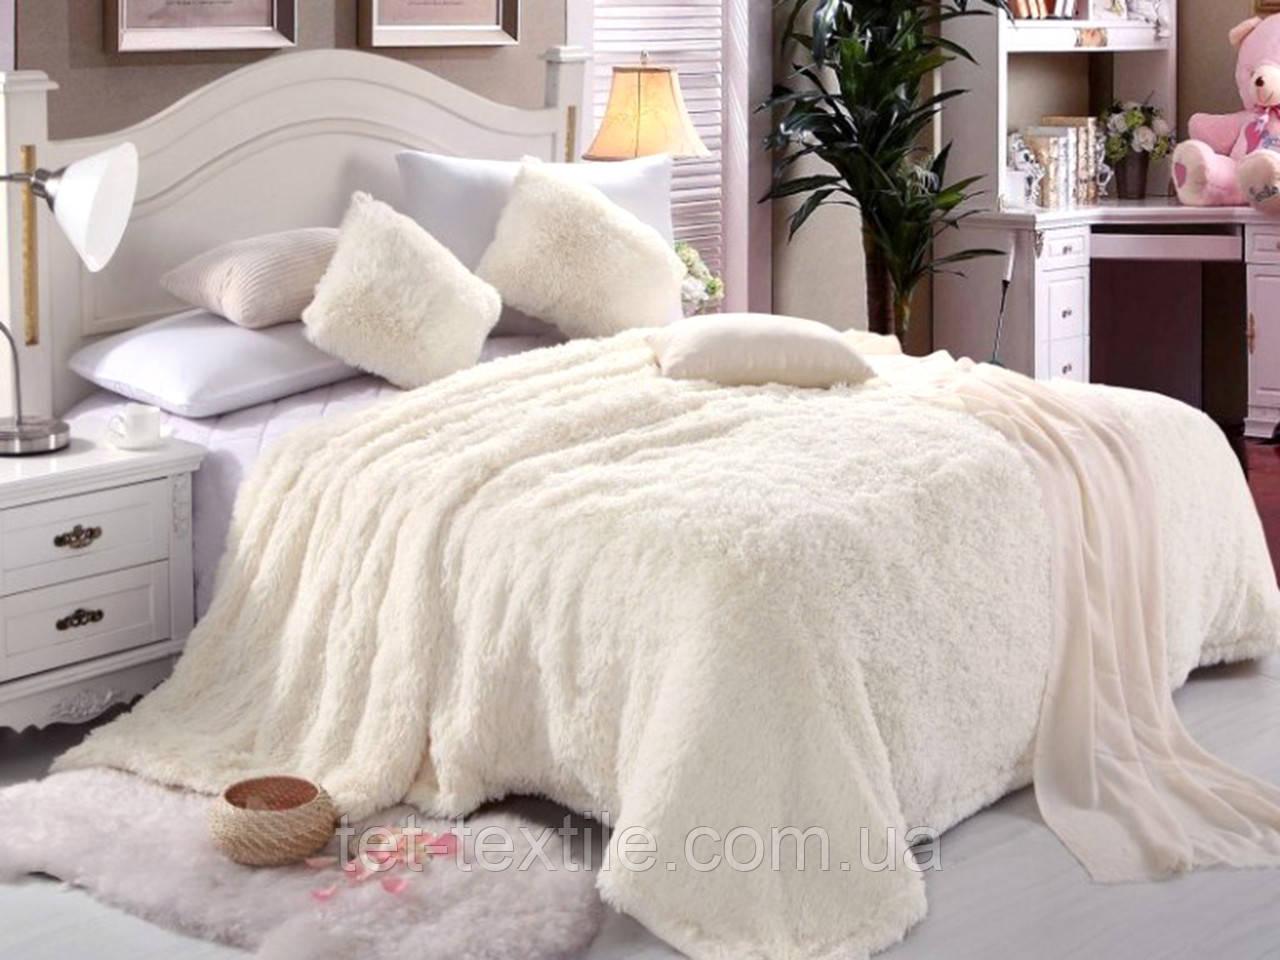 "Плед-покрывало ""Мишка"" Белый (160x210)"